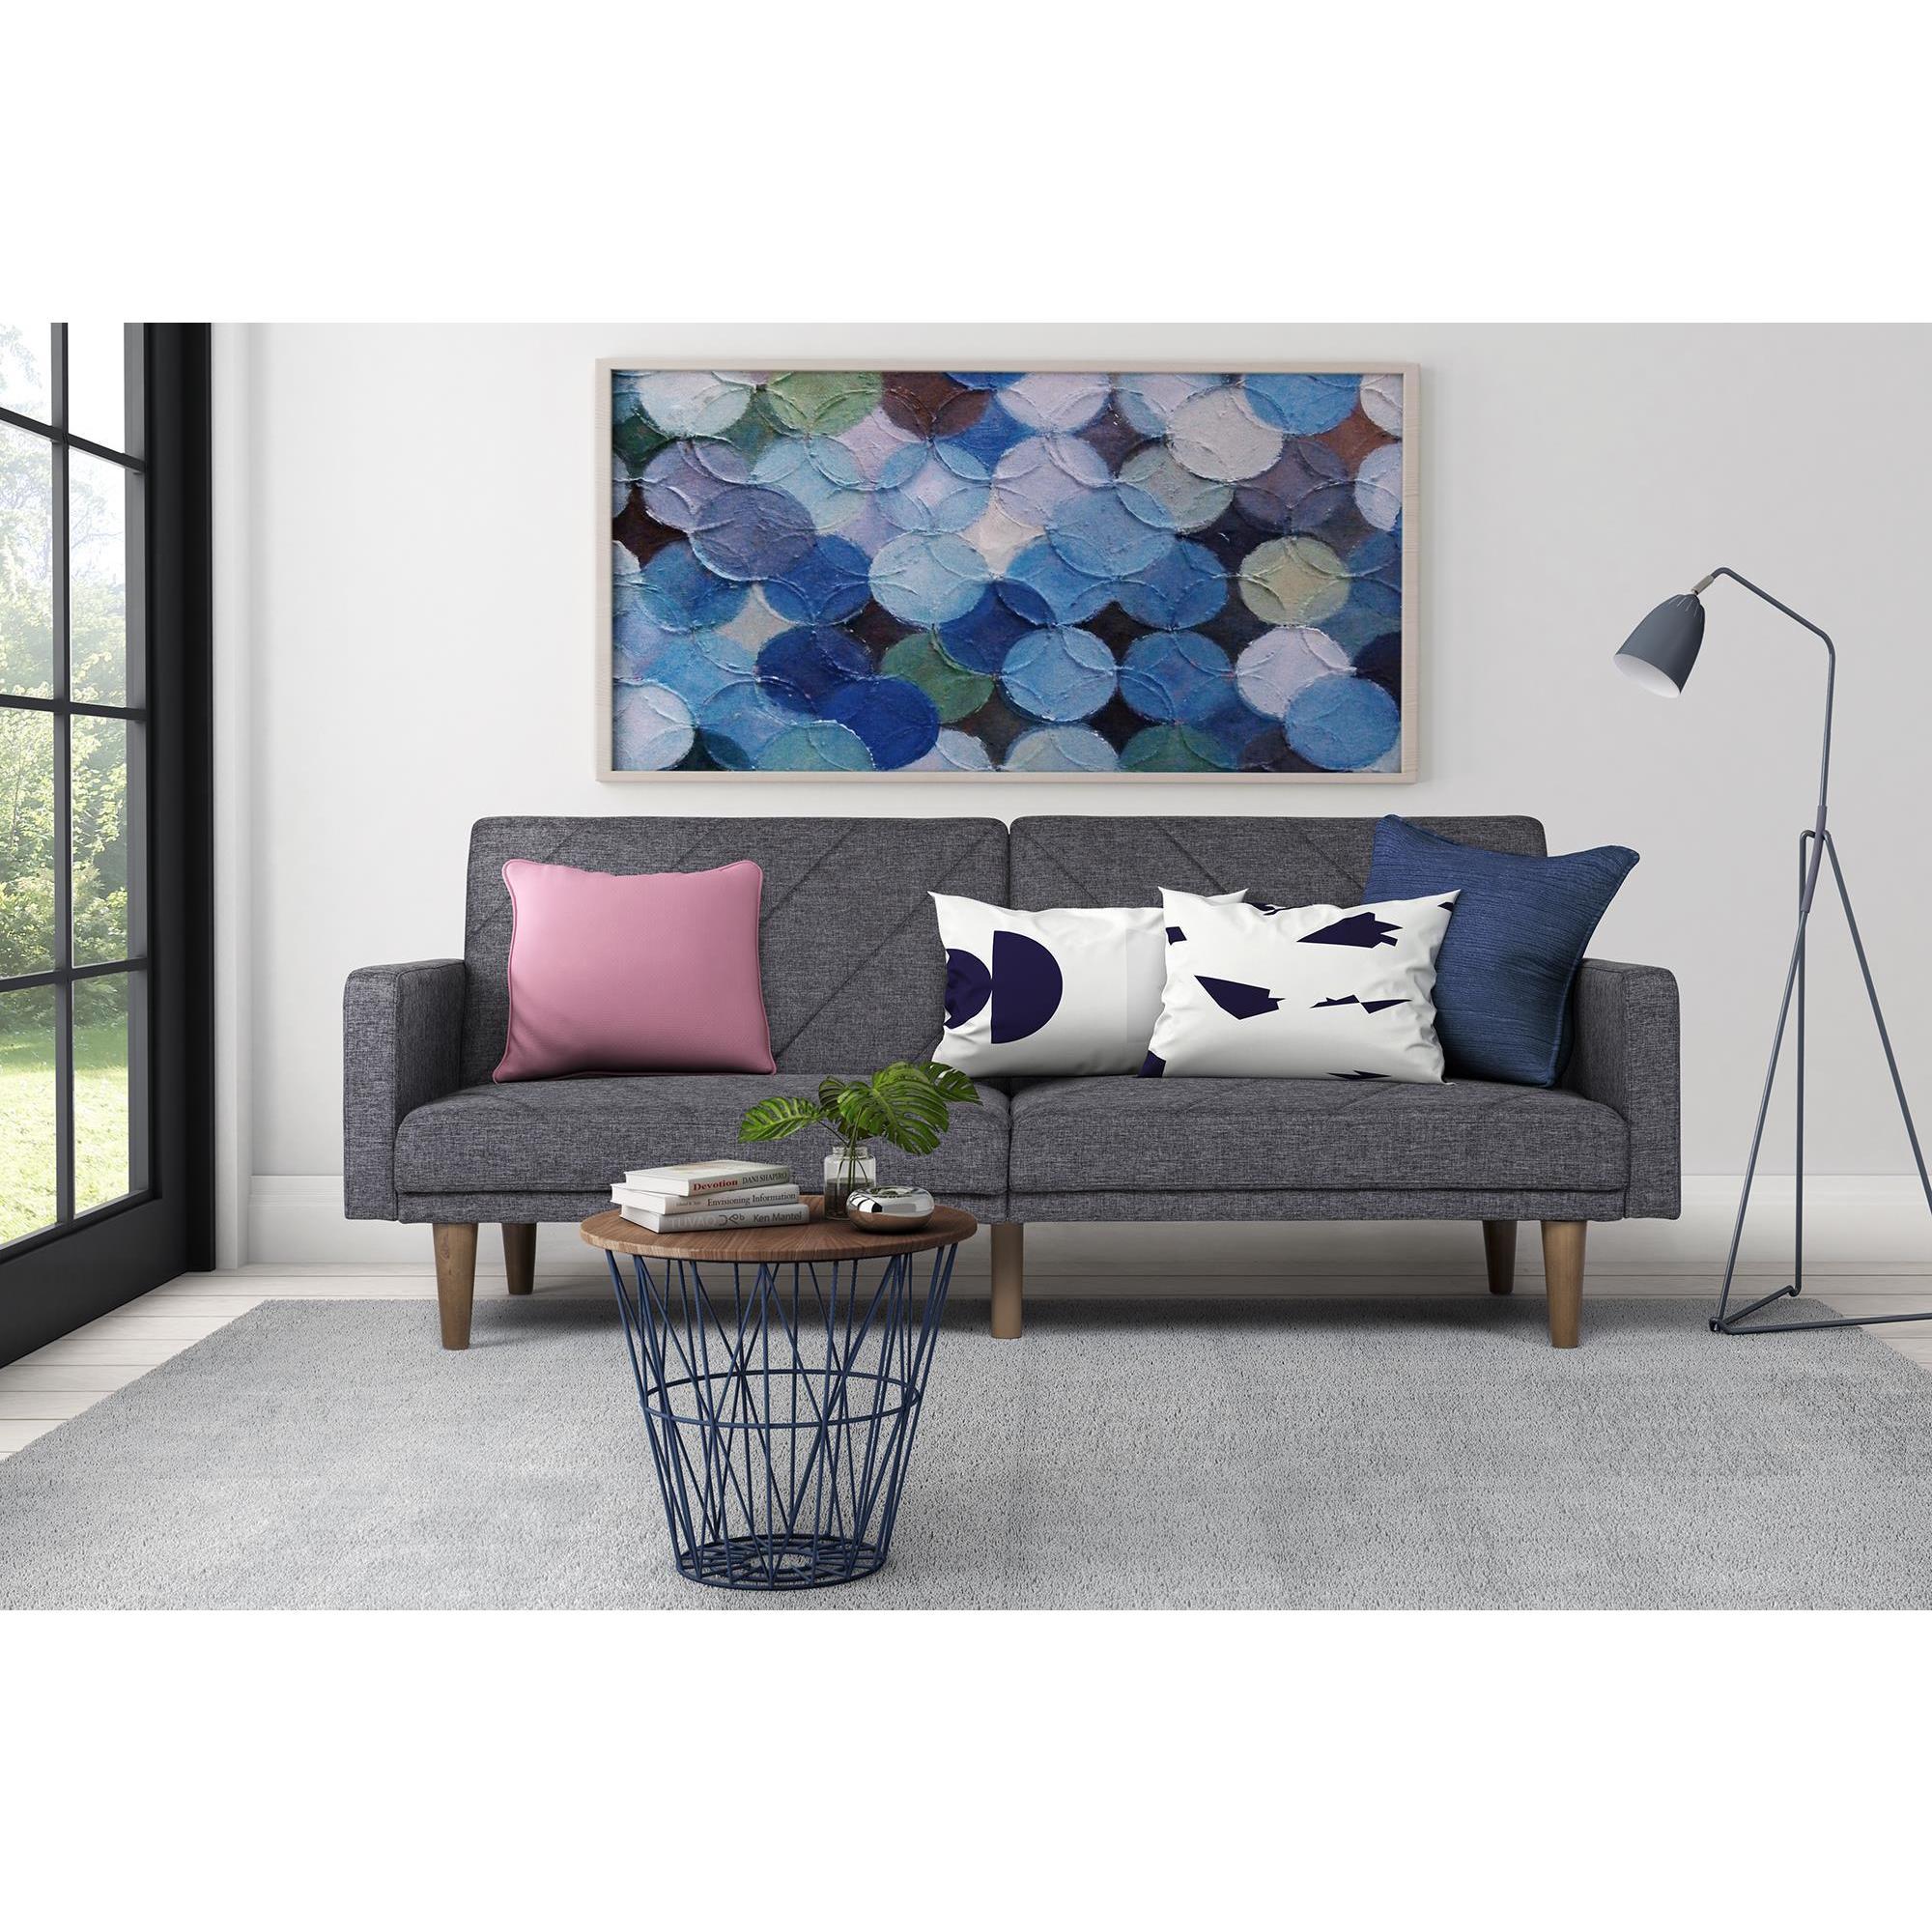 Shop Dhp Paxson Grey Linen Futon Free Shipping On Orders